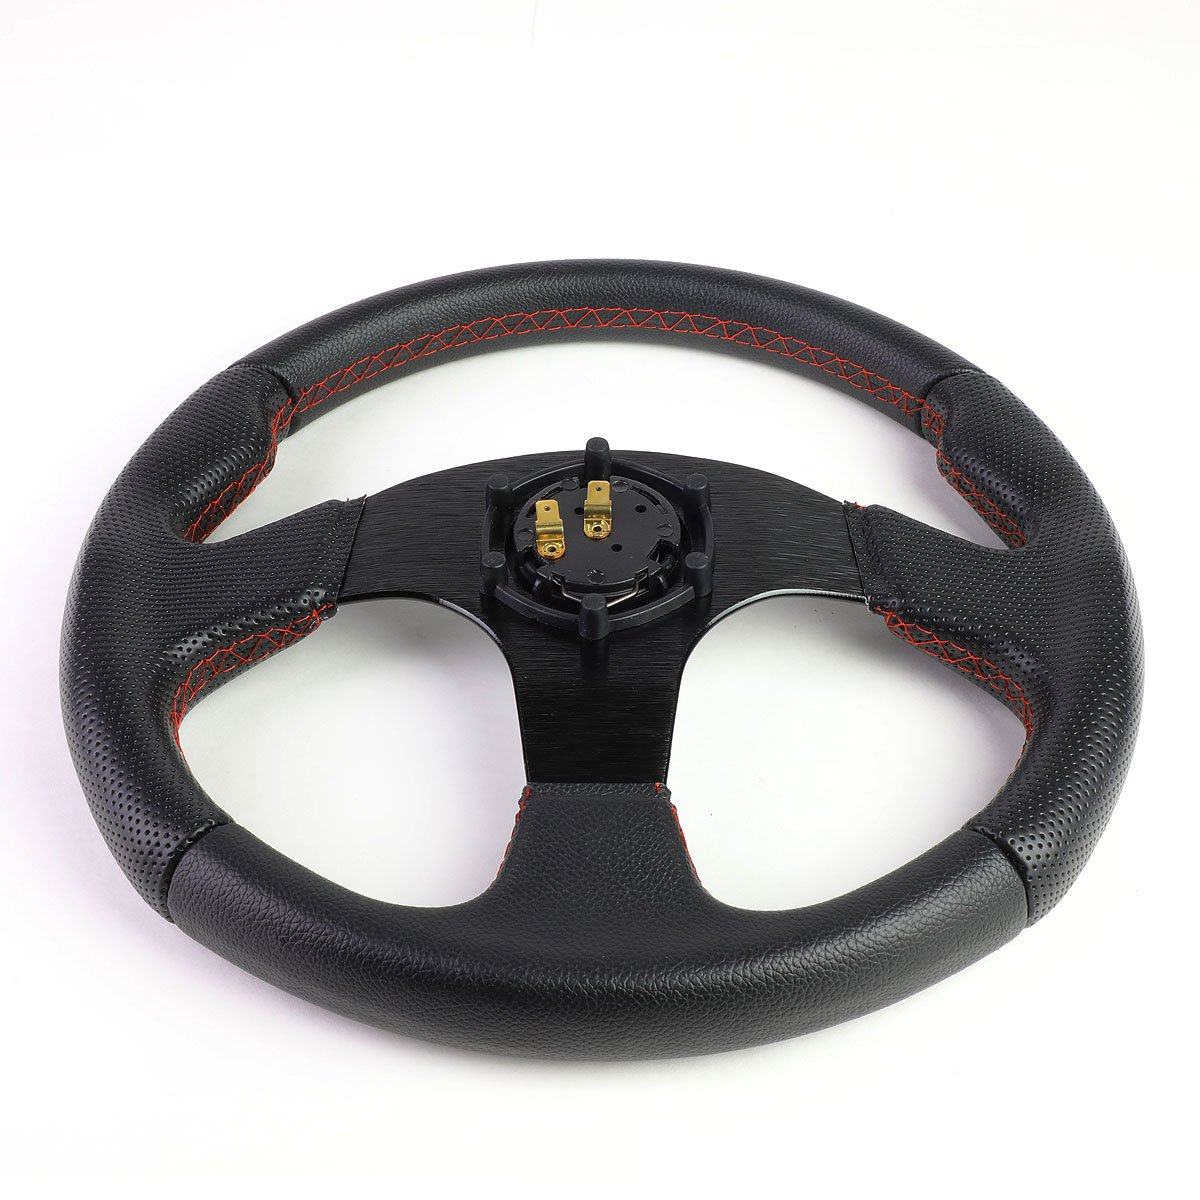 Horn Button Black Spoke//Red Stitch 320mm 6-Bolt Aluminum Frame Vinyl Leather Cover Steering wheels